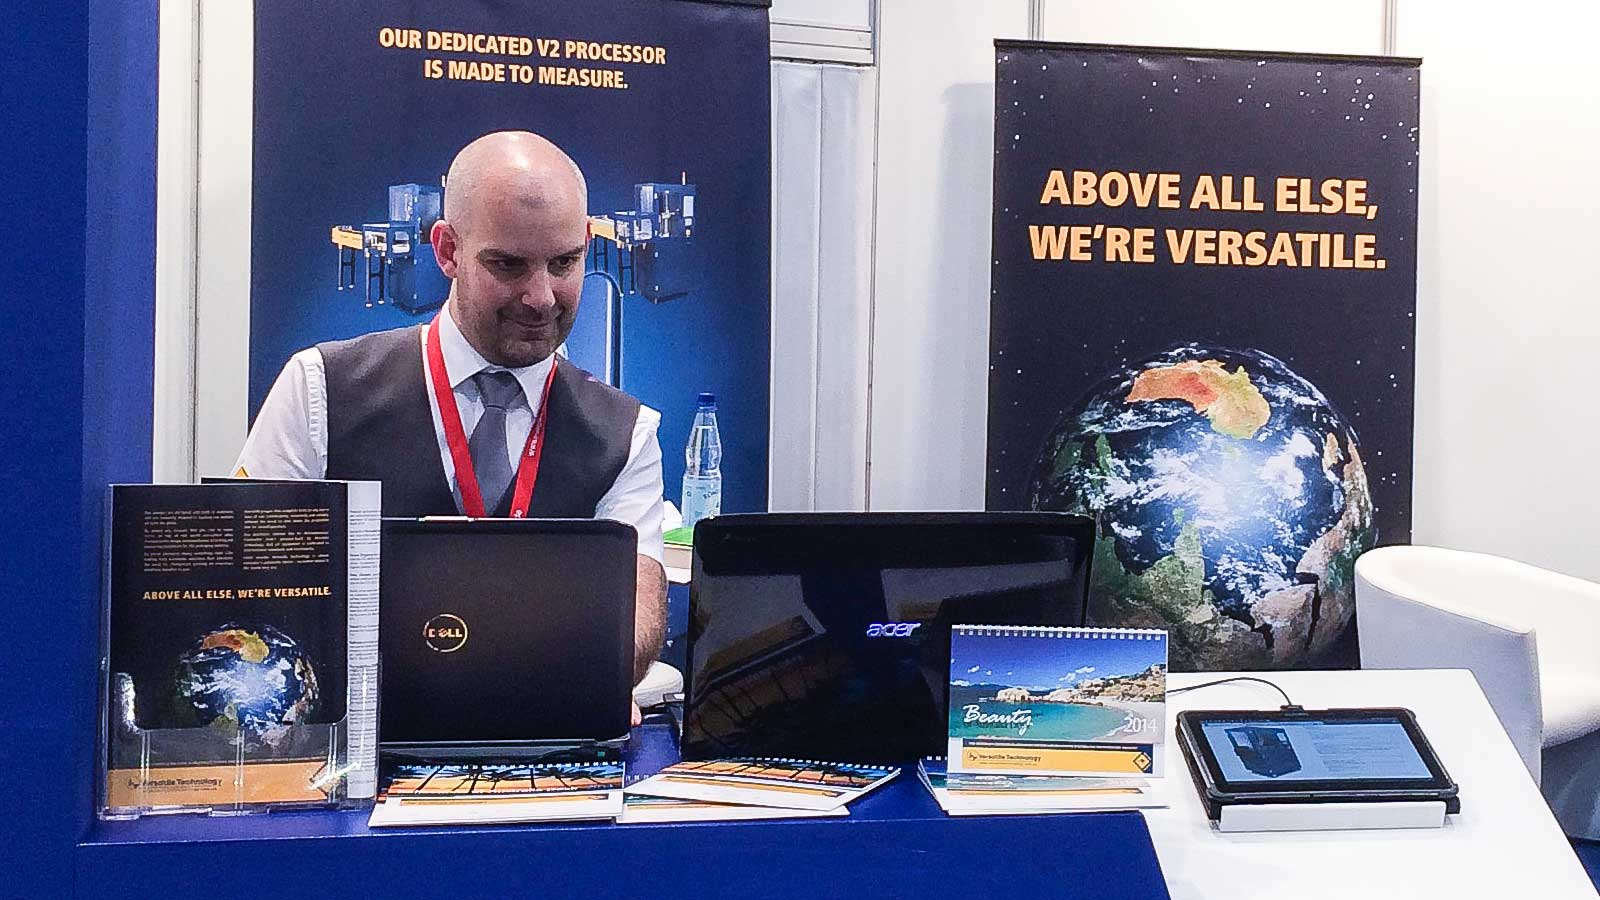 versatile-technology-at-metpack-2014-3